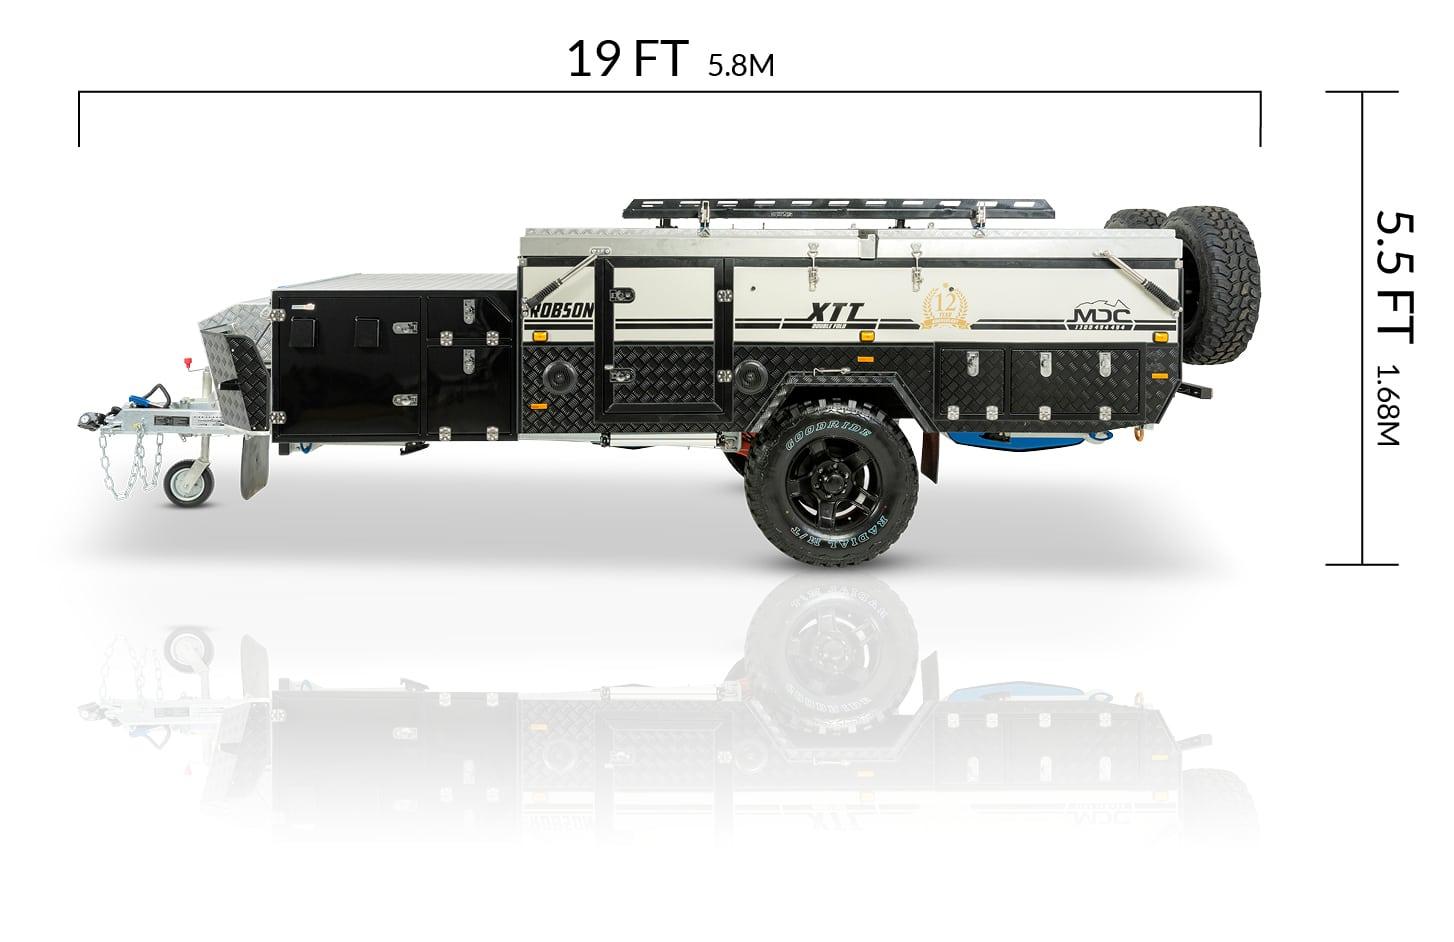 MDC USA Robson XTT overlanding camper trailer dimensions